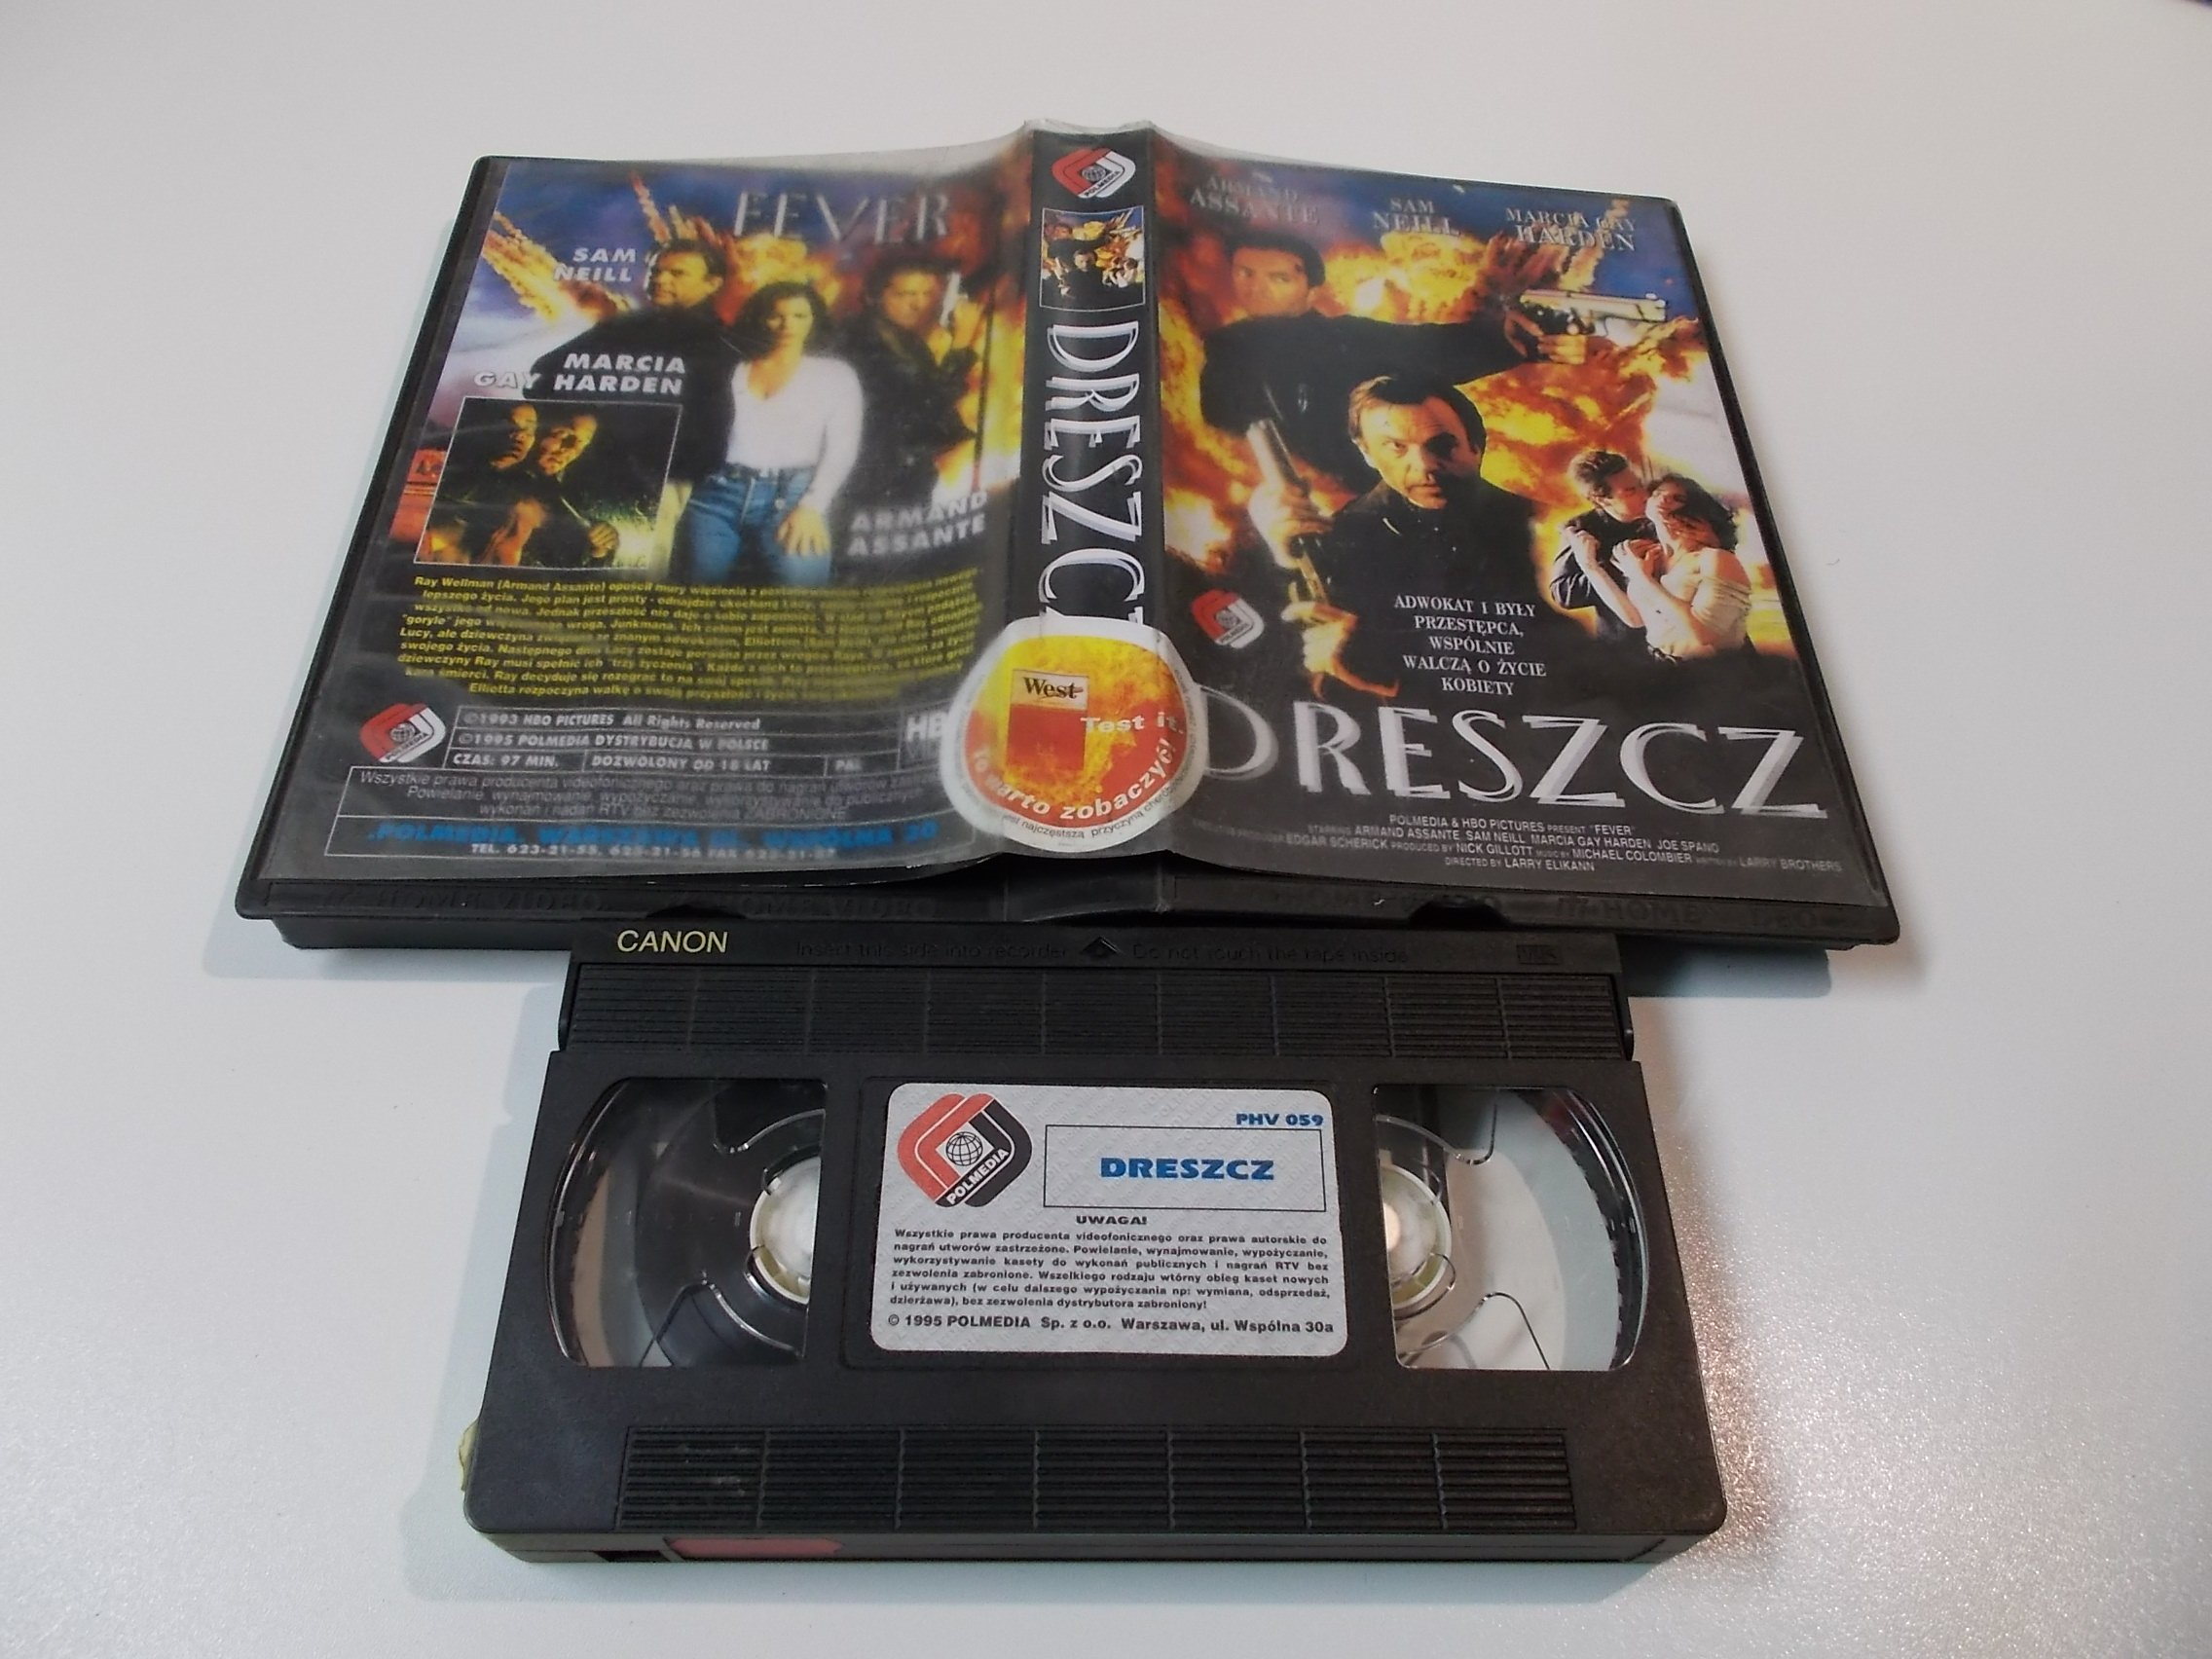 DRESZCZ - kaseta Video VHS - 1437 Sklep